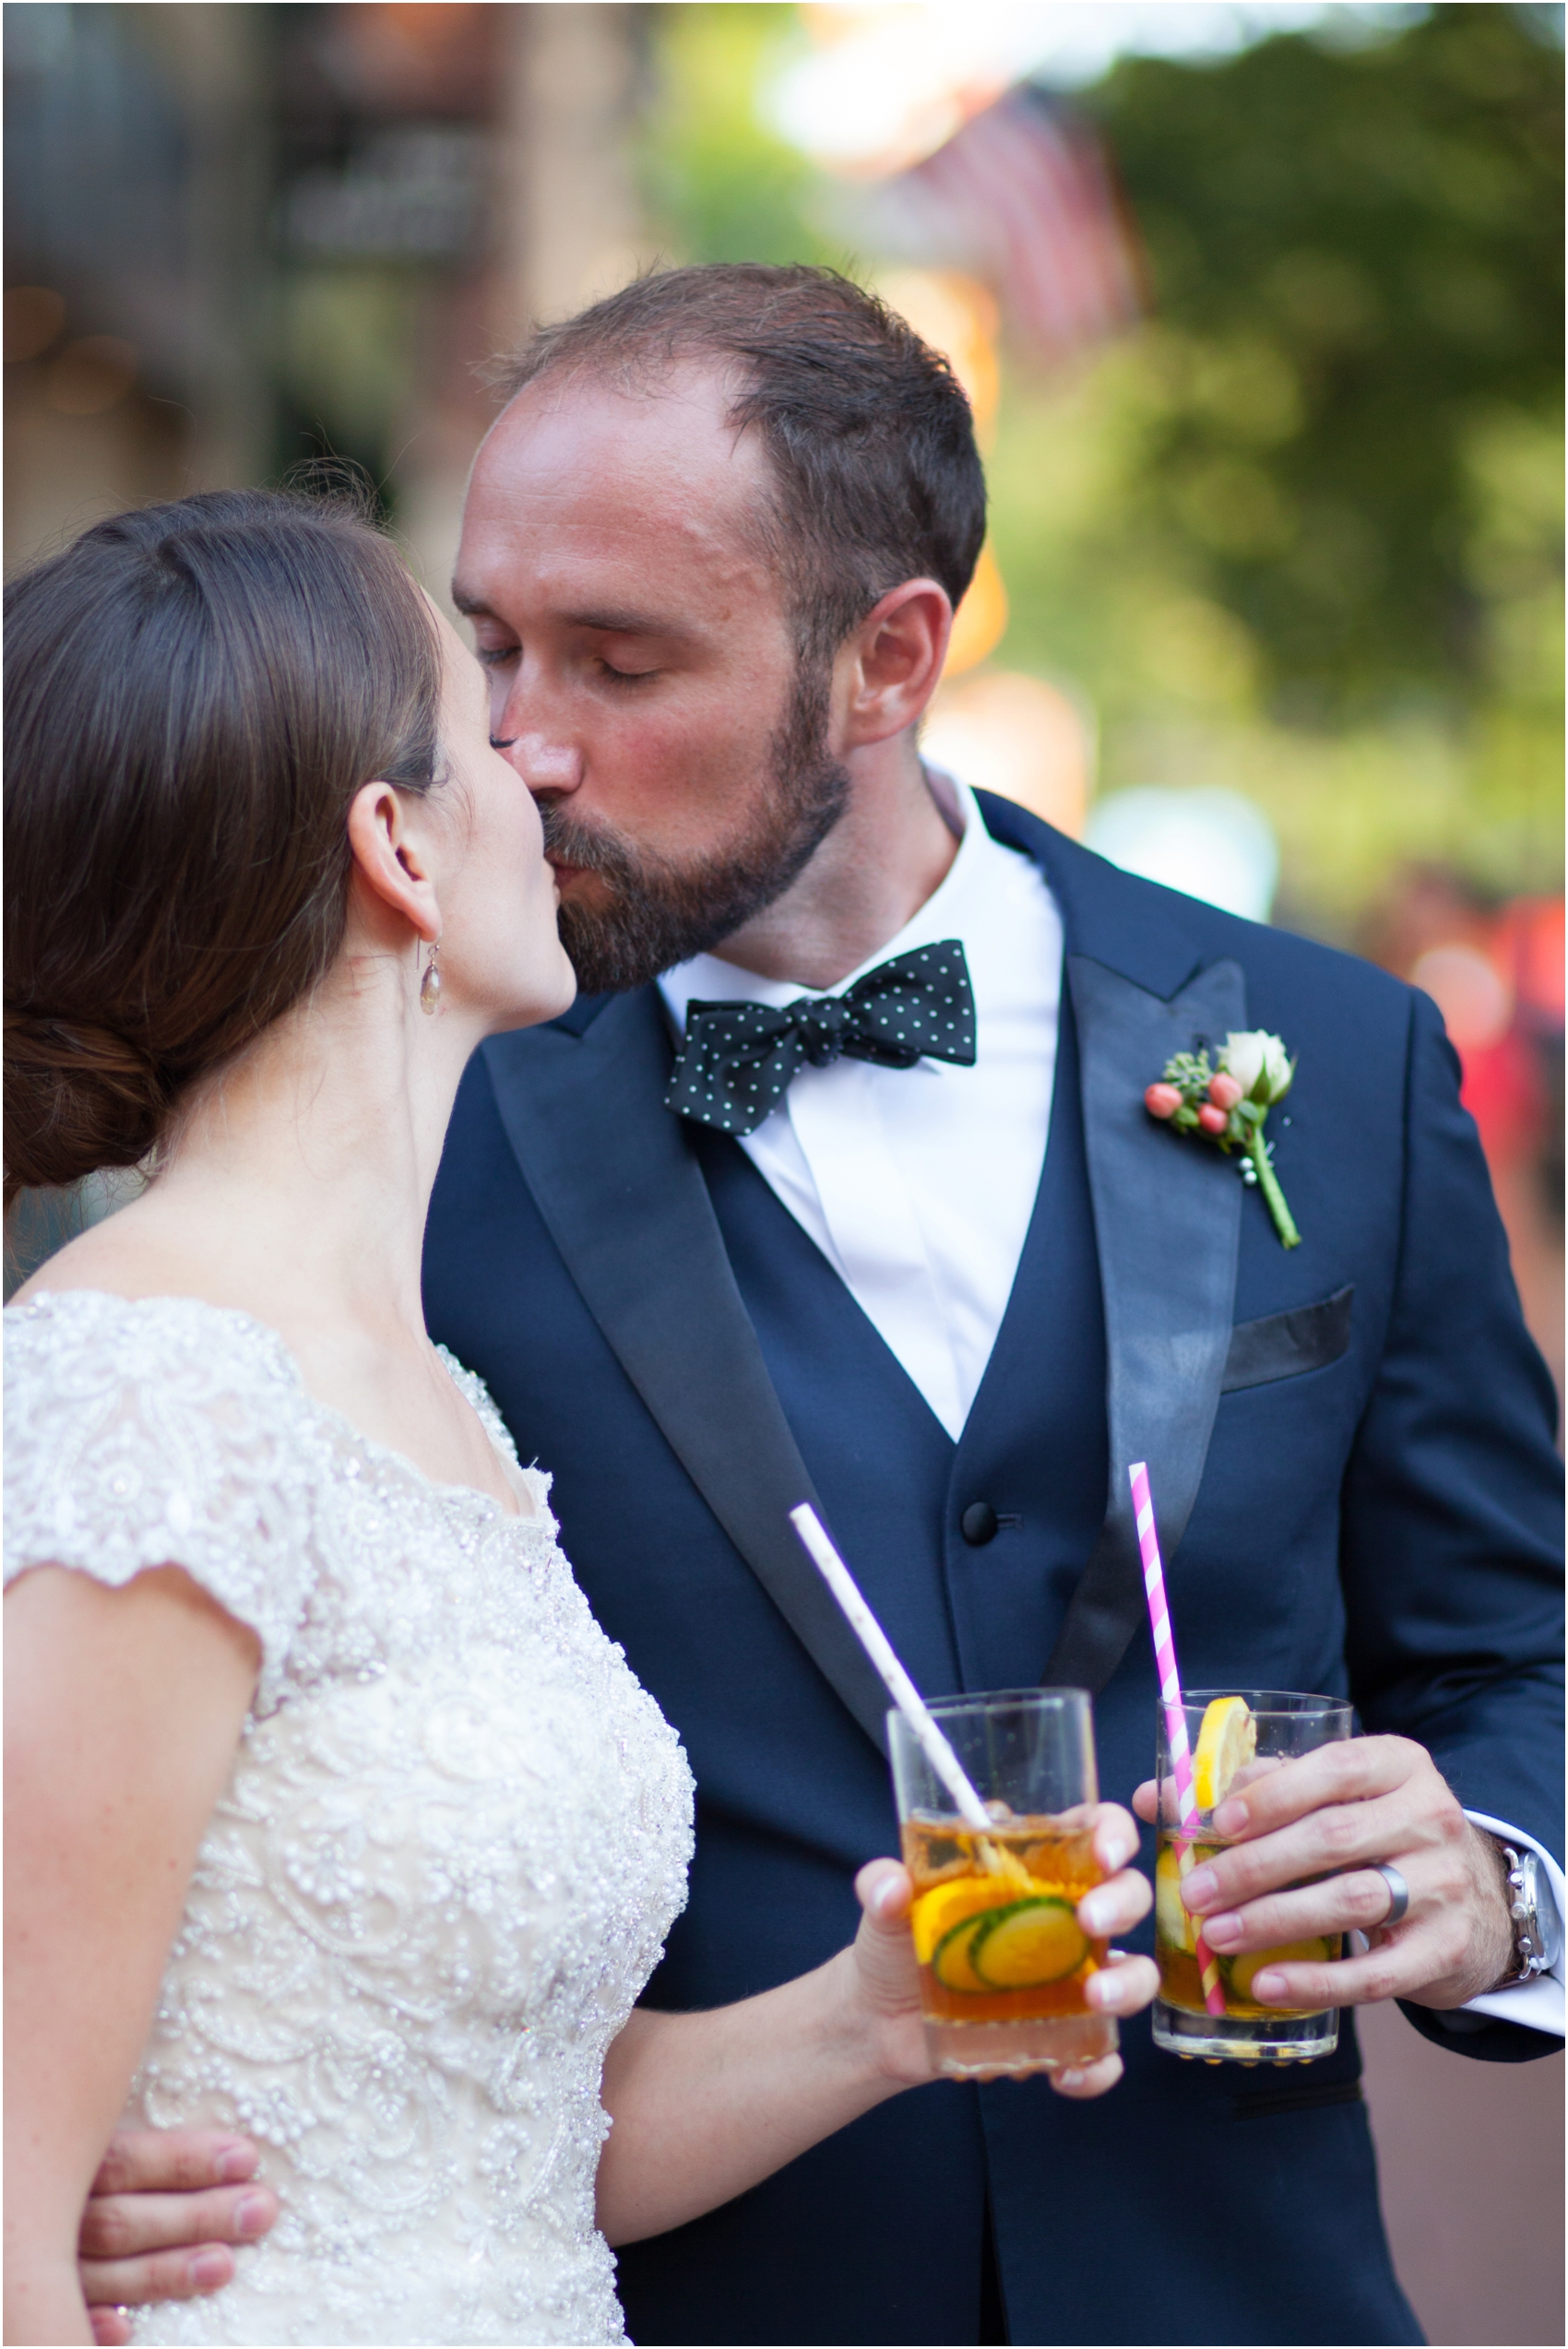 Old-Metropolitan-Hall-Wedding-Charlottesville-Virginia-2-35.jpg